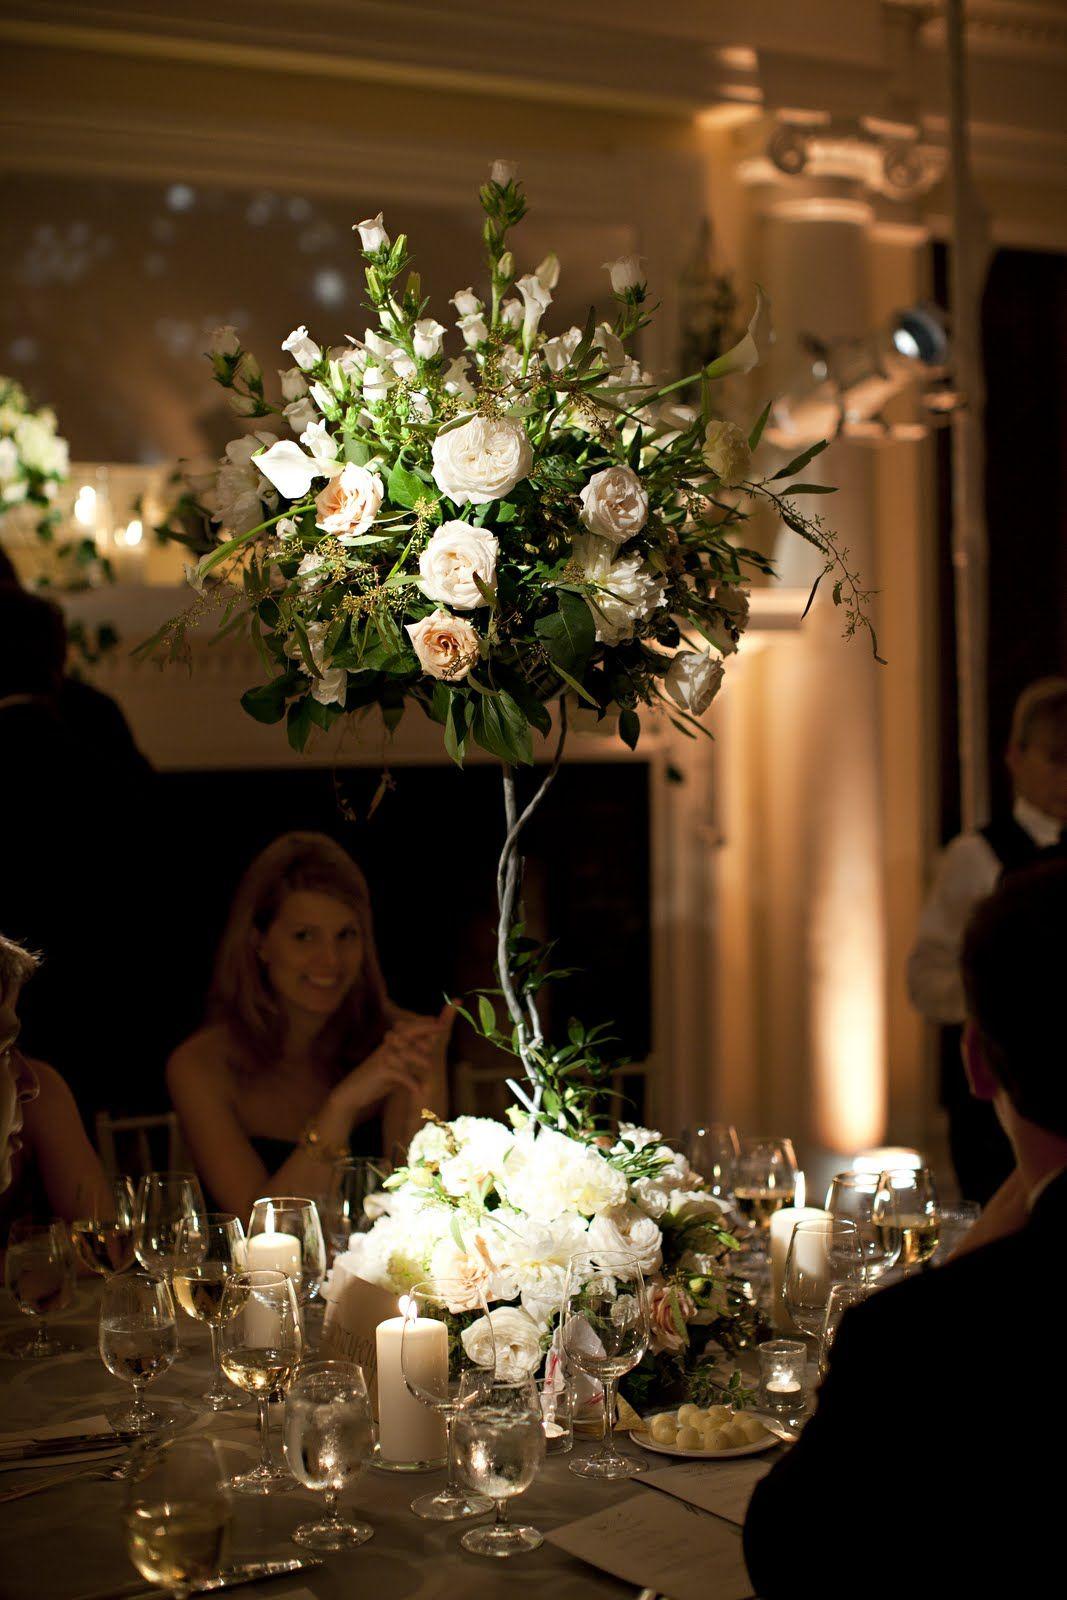 Table Decorations For 60th Wedding Anniversary Valoblogi Com